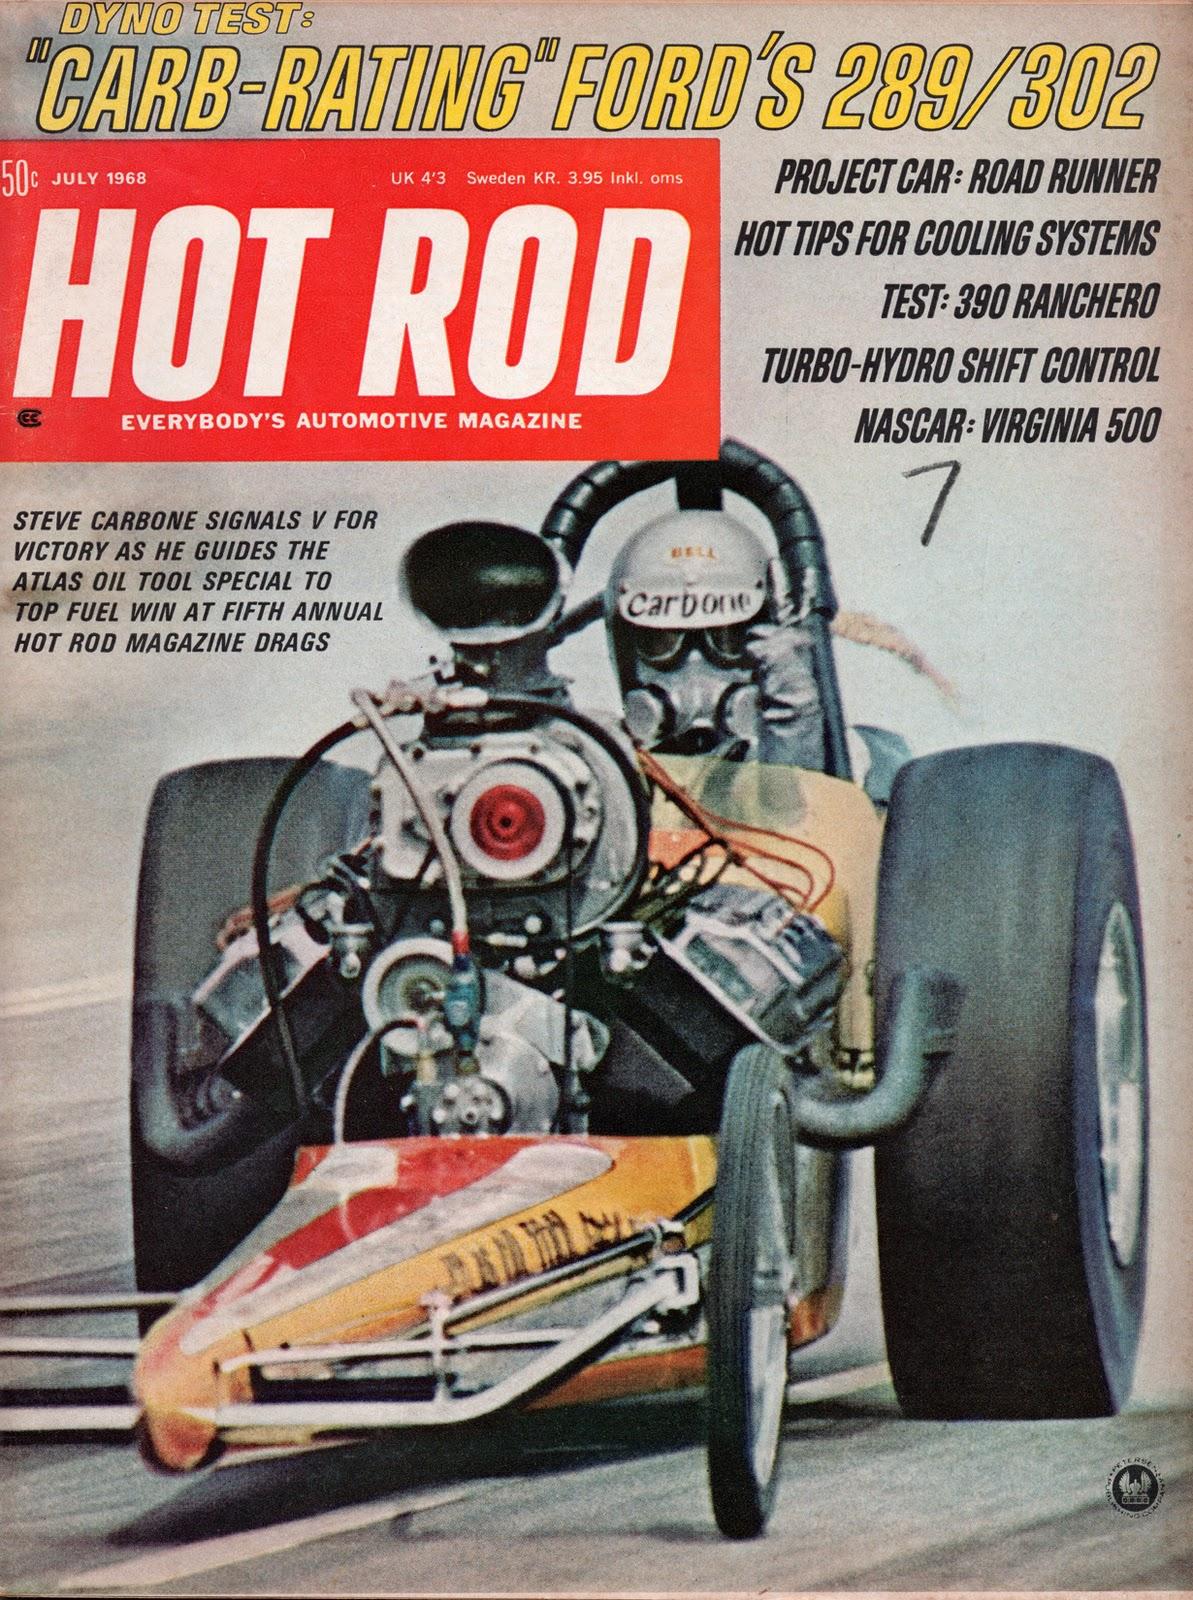 racefriv.com: Hot Rod